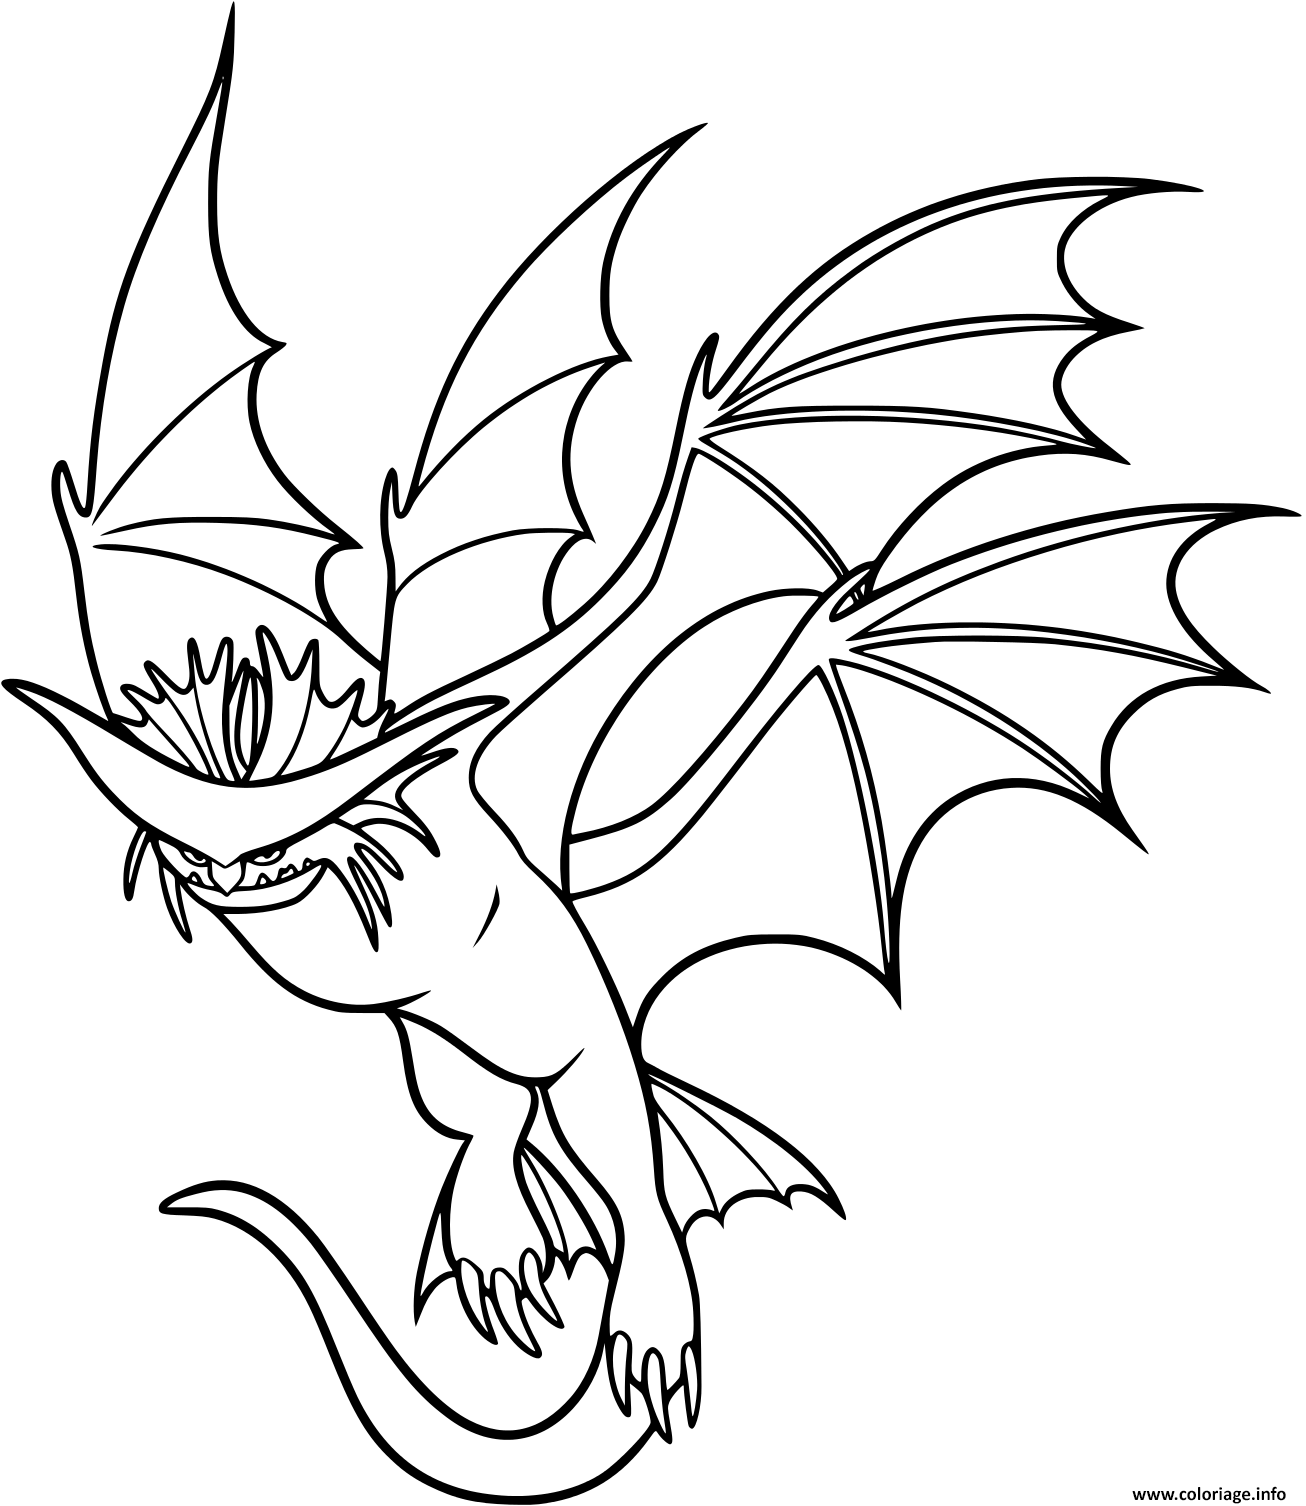 Dessin Cloudjumper Dragon Coloriage Gratuit à Imprimer